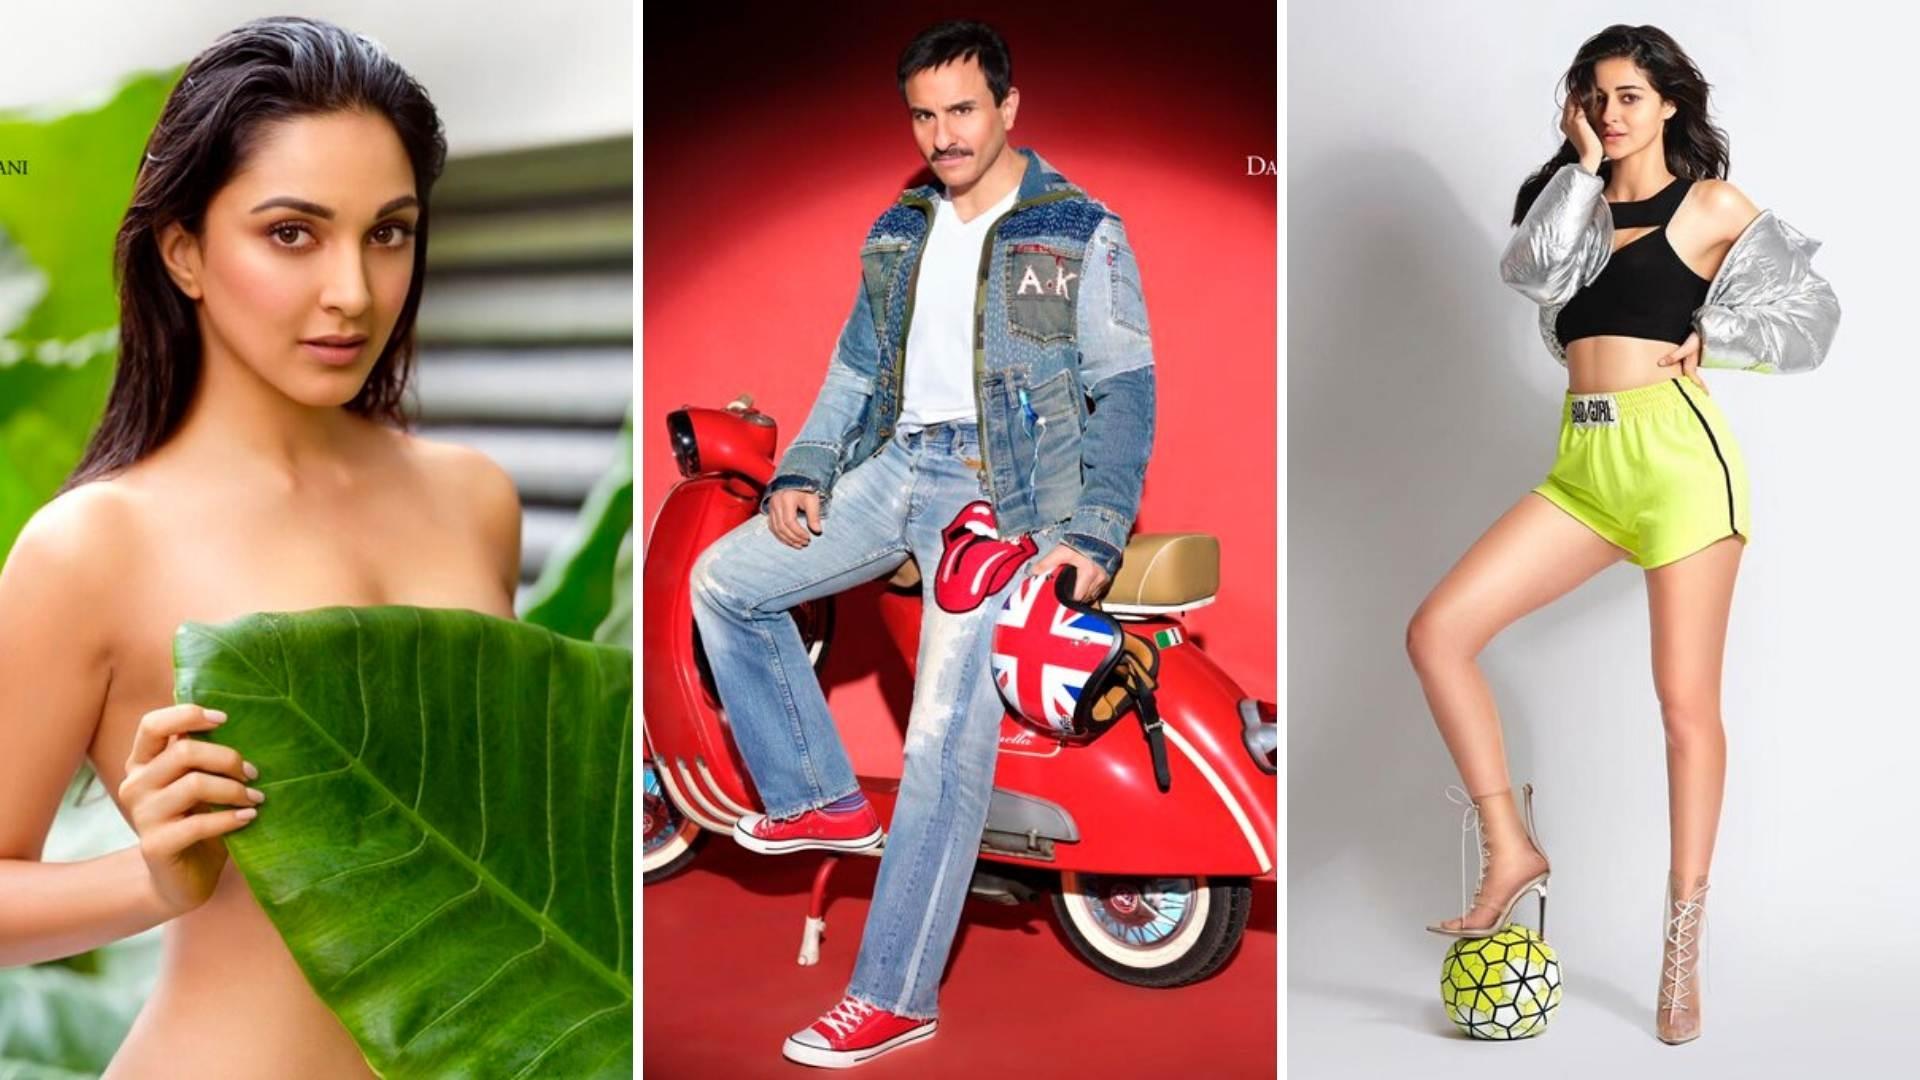 Pics: Kiara, Saif, Ananya for Dabboo Ratnani Calendar 2020